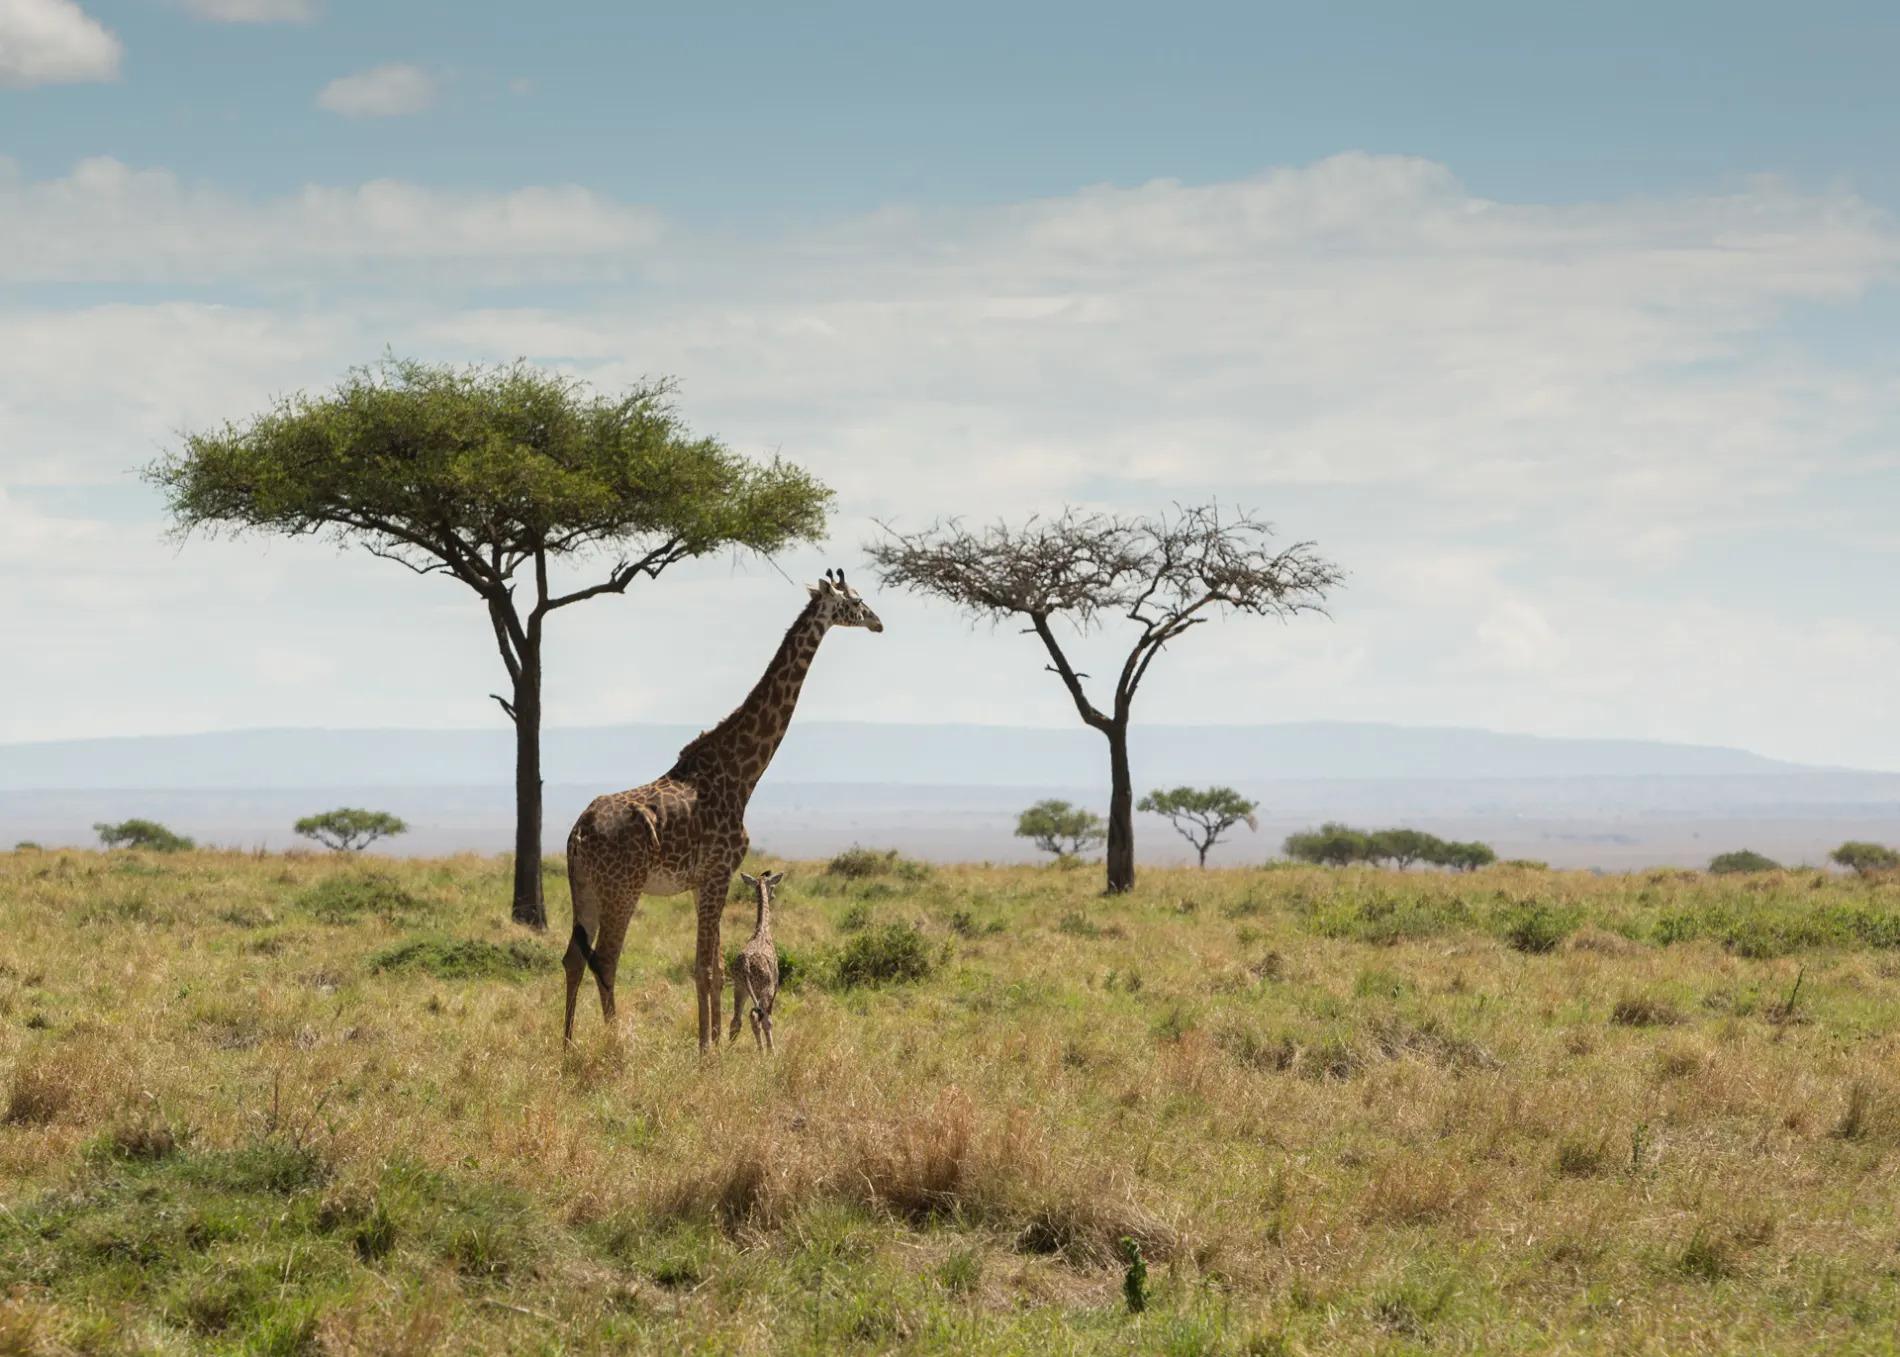 Giraffe and baby safe